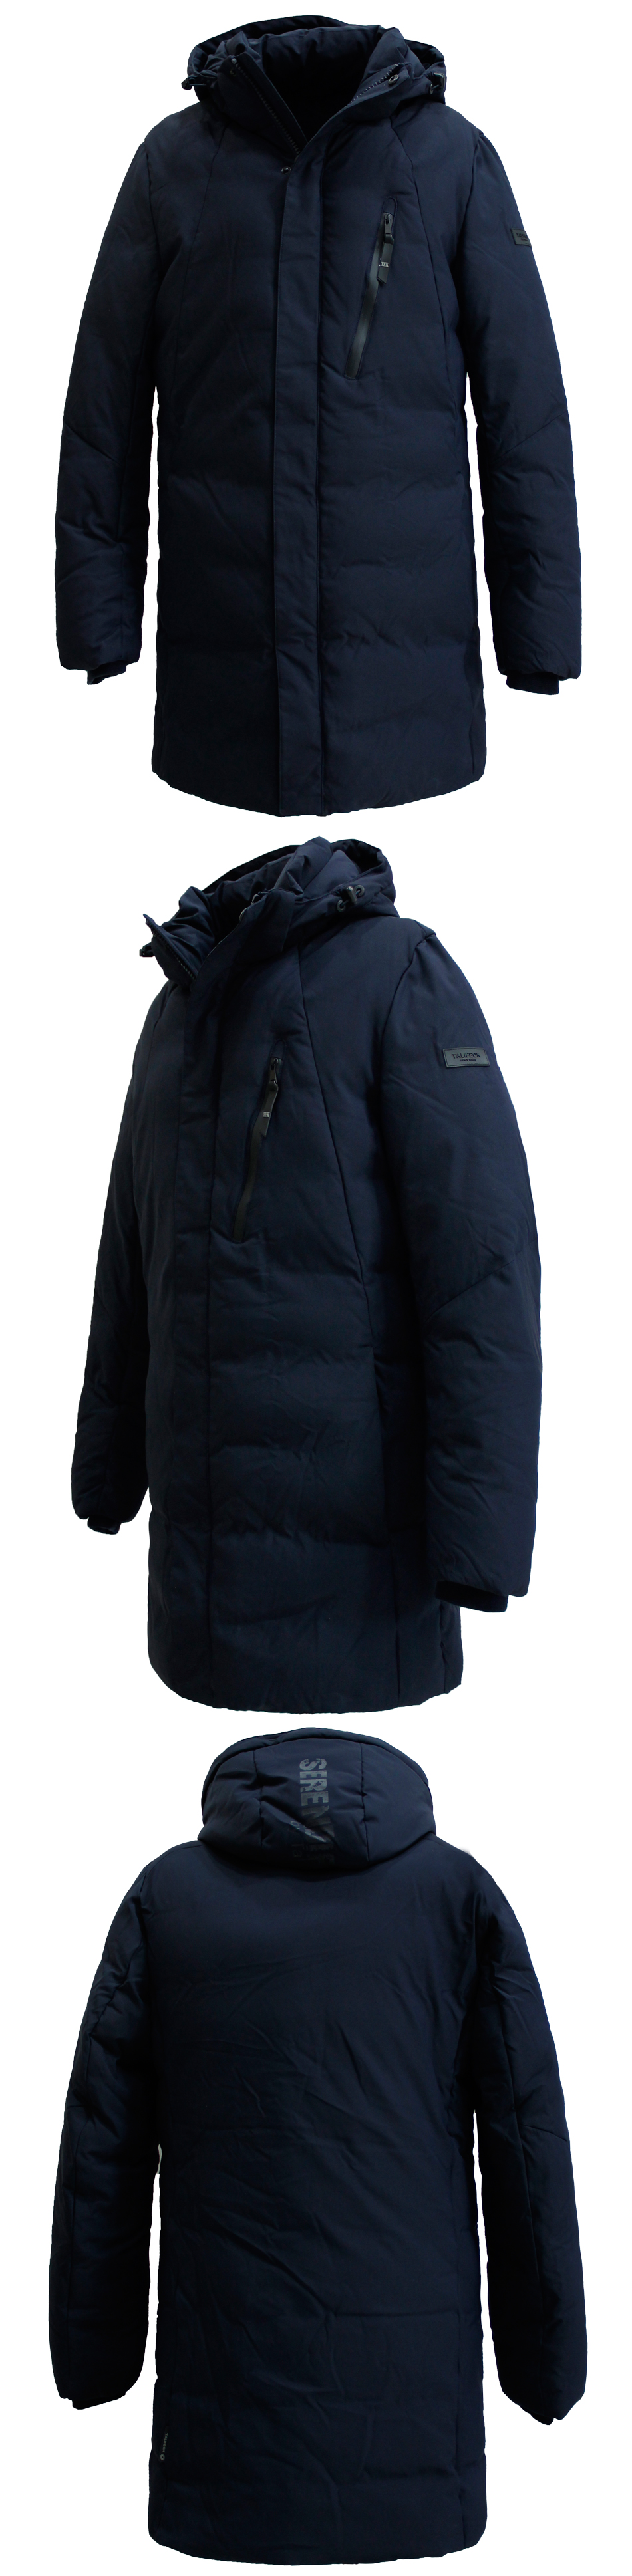 Padded Coat 2 (7)